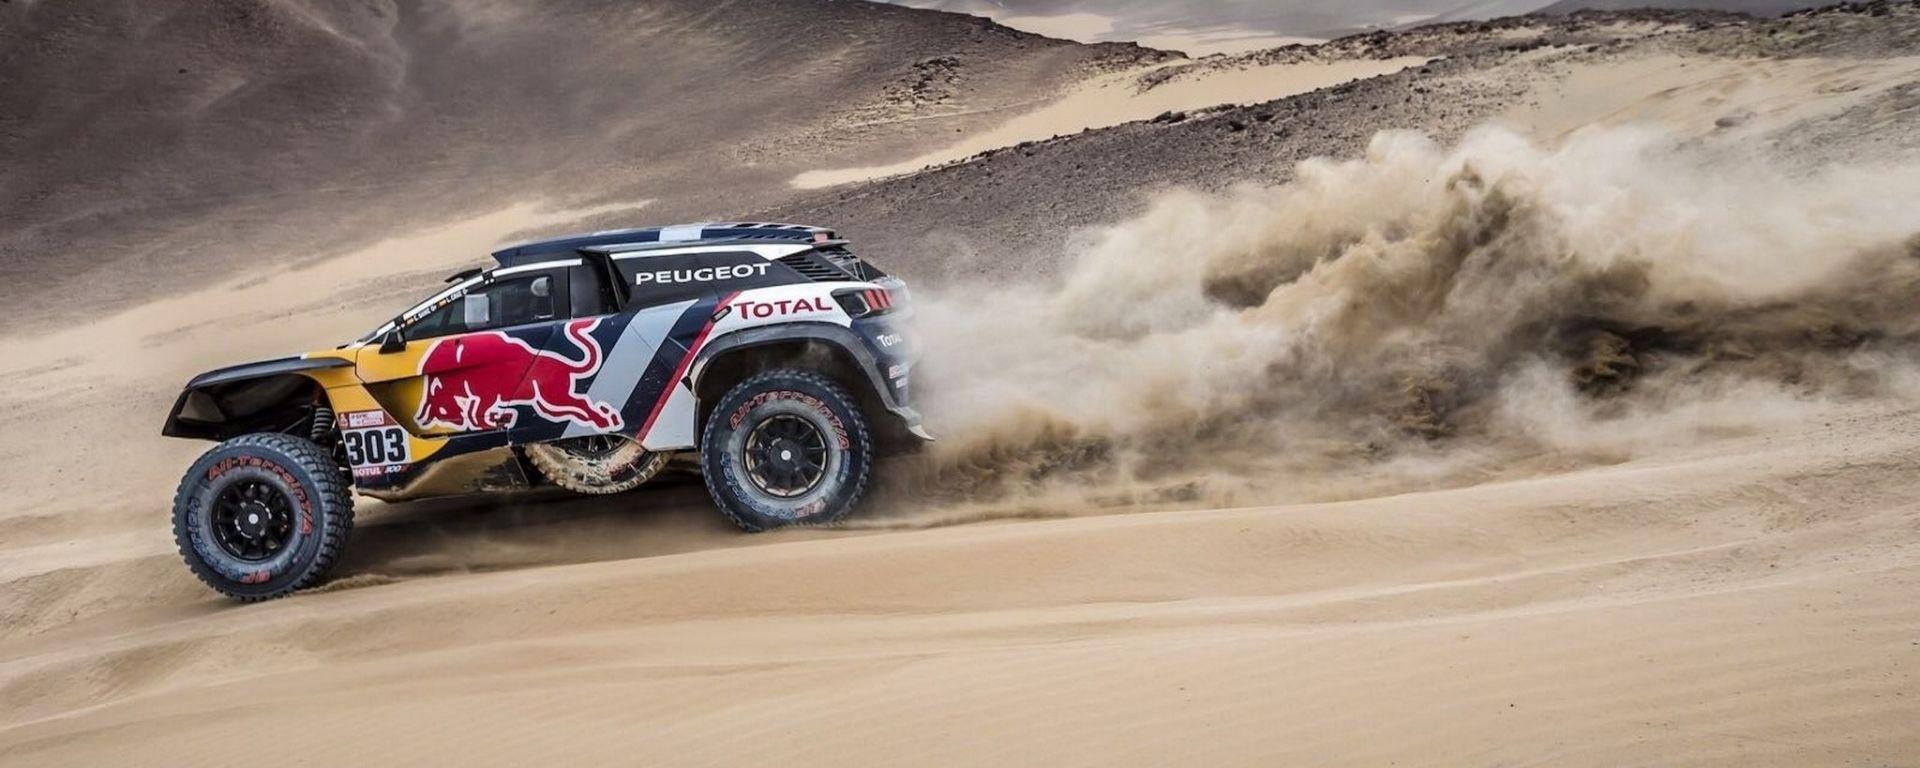 Dakar 2018: la Peugeot 3008 DKR sulle dune della Tappa 2